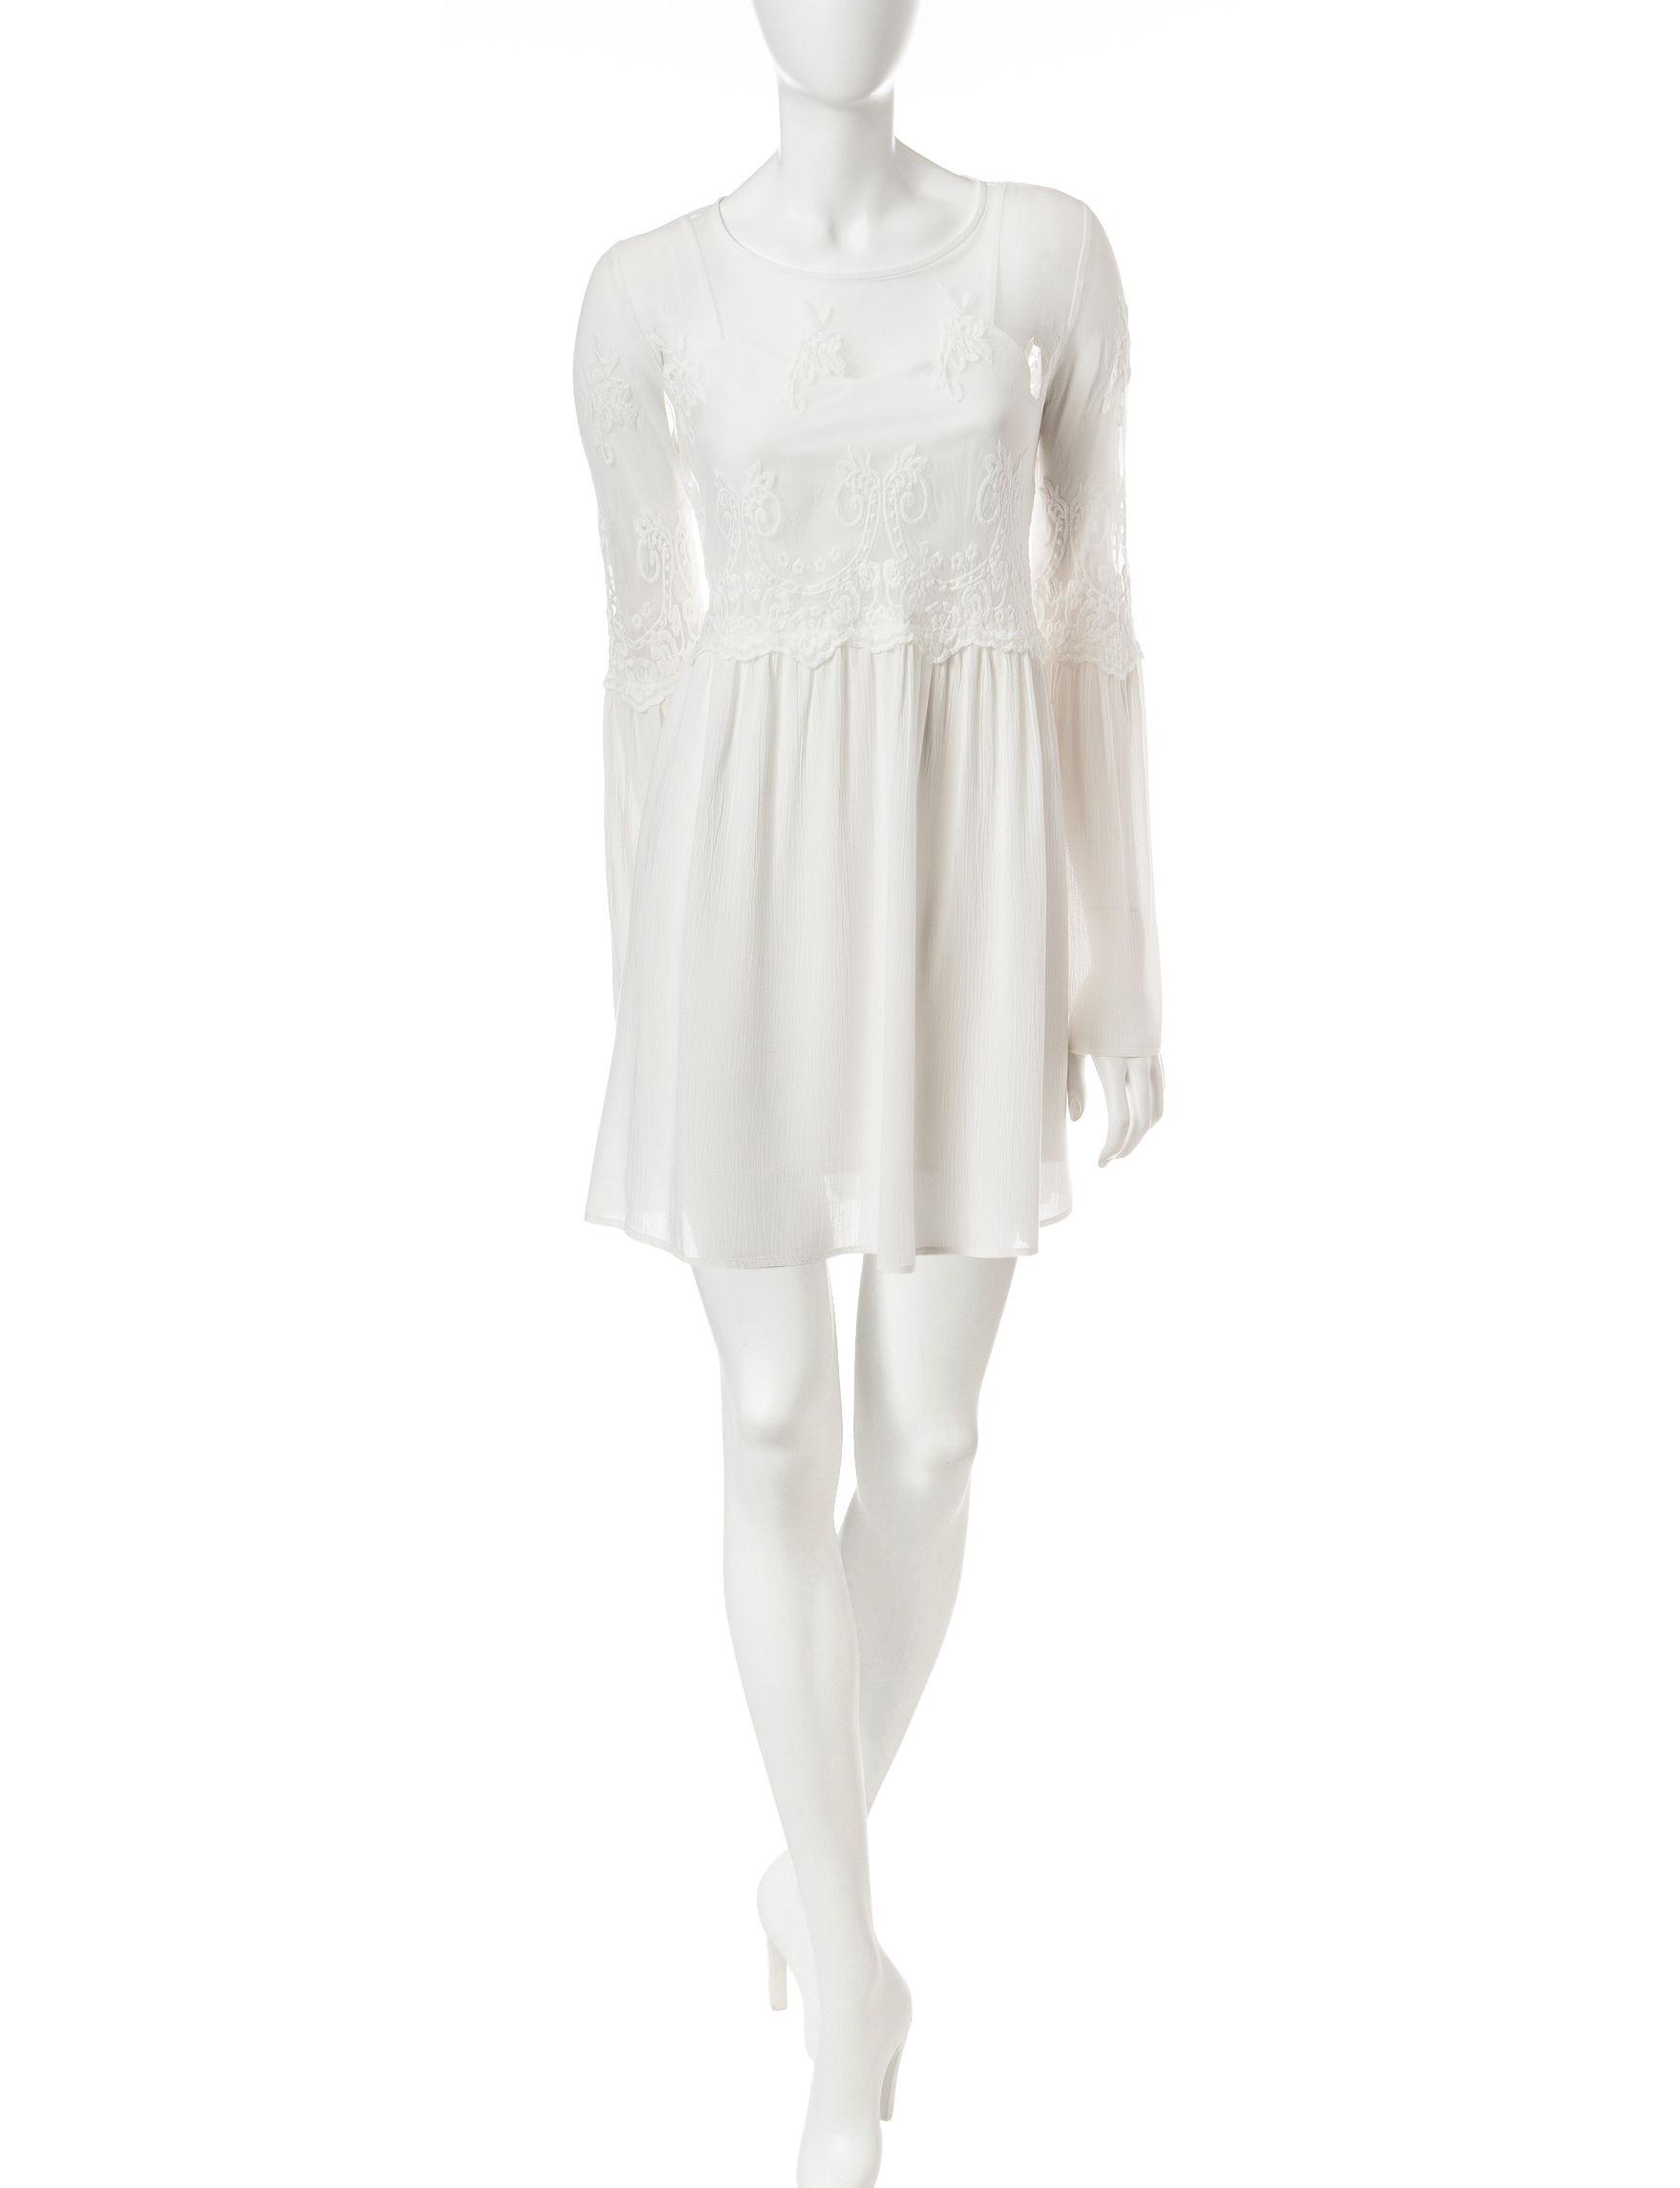 Trixxi Ivory Shift Dresses